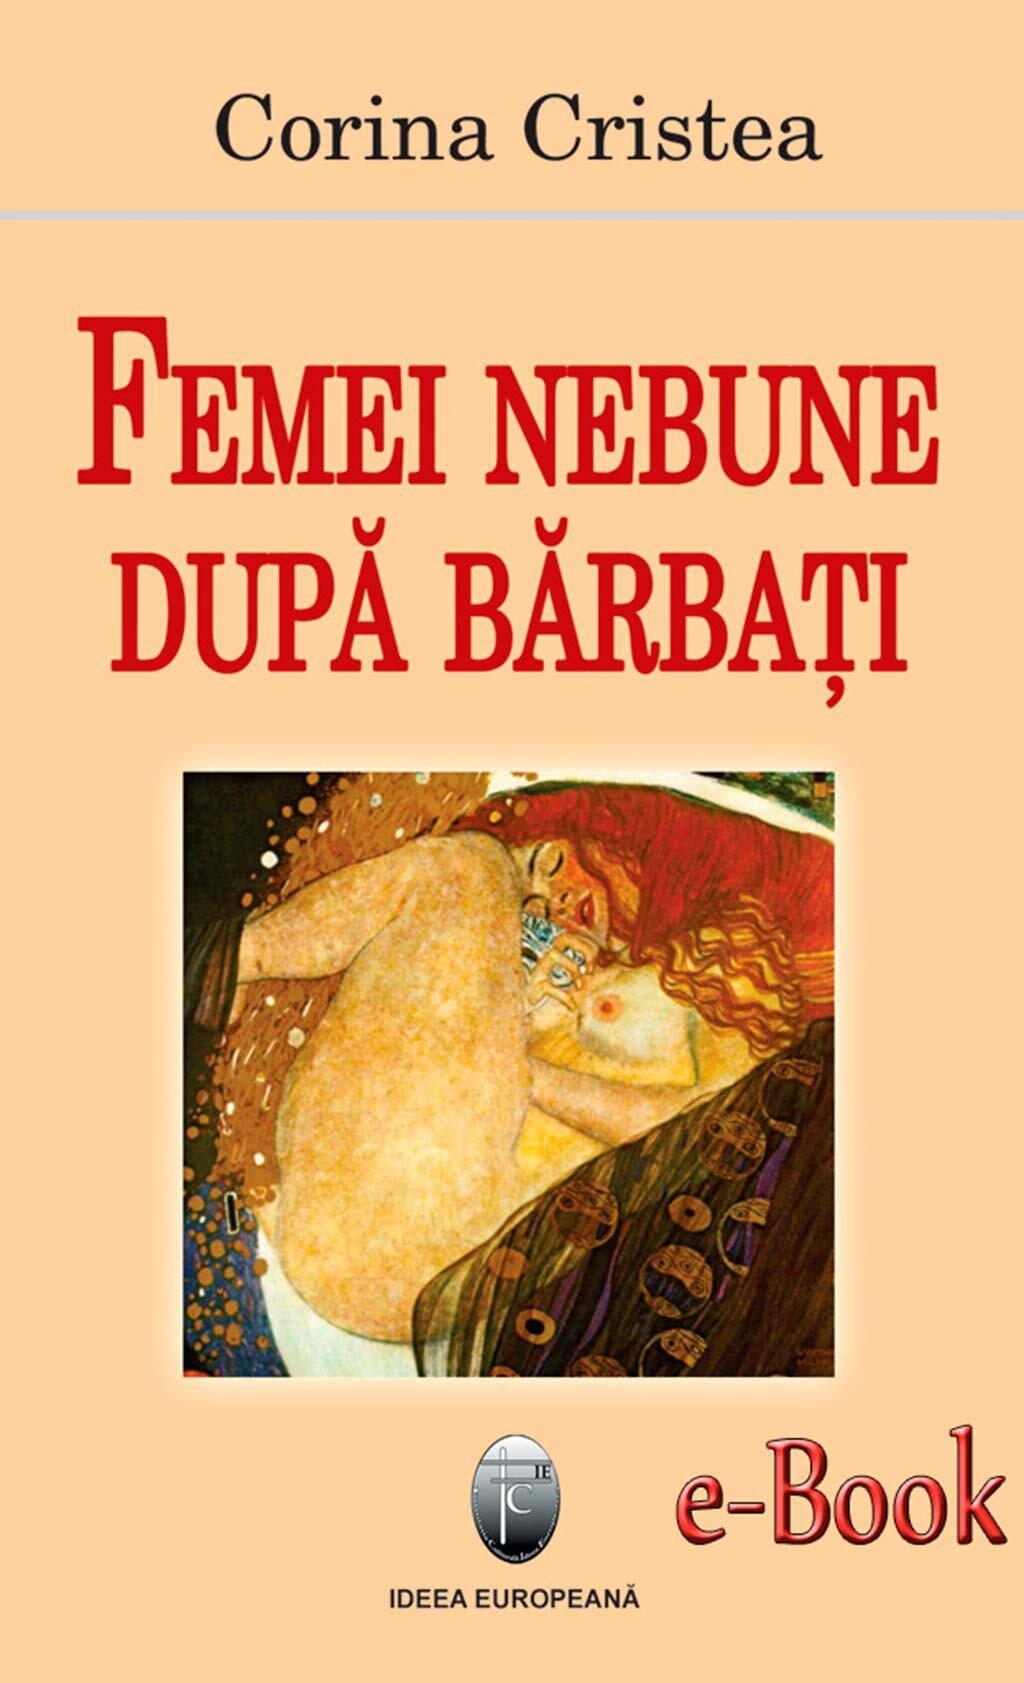 Femei nebune dupa barbati (eBook)